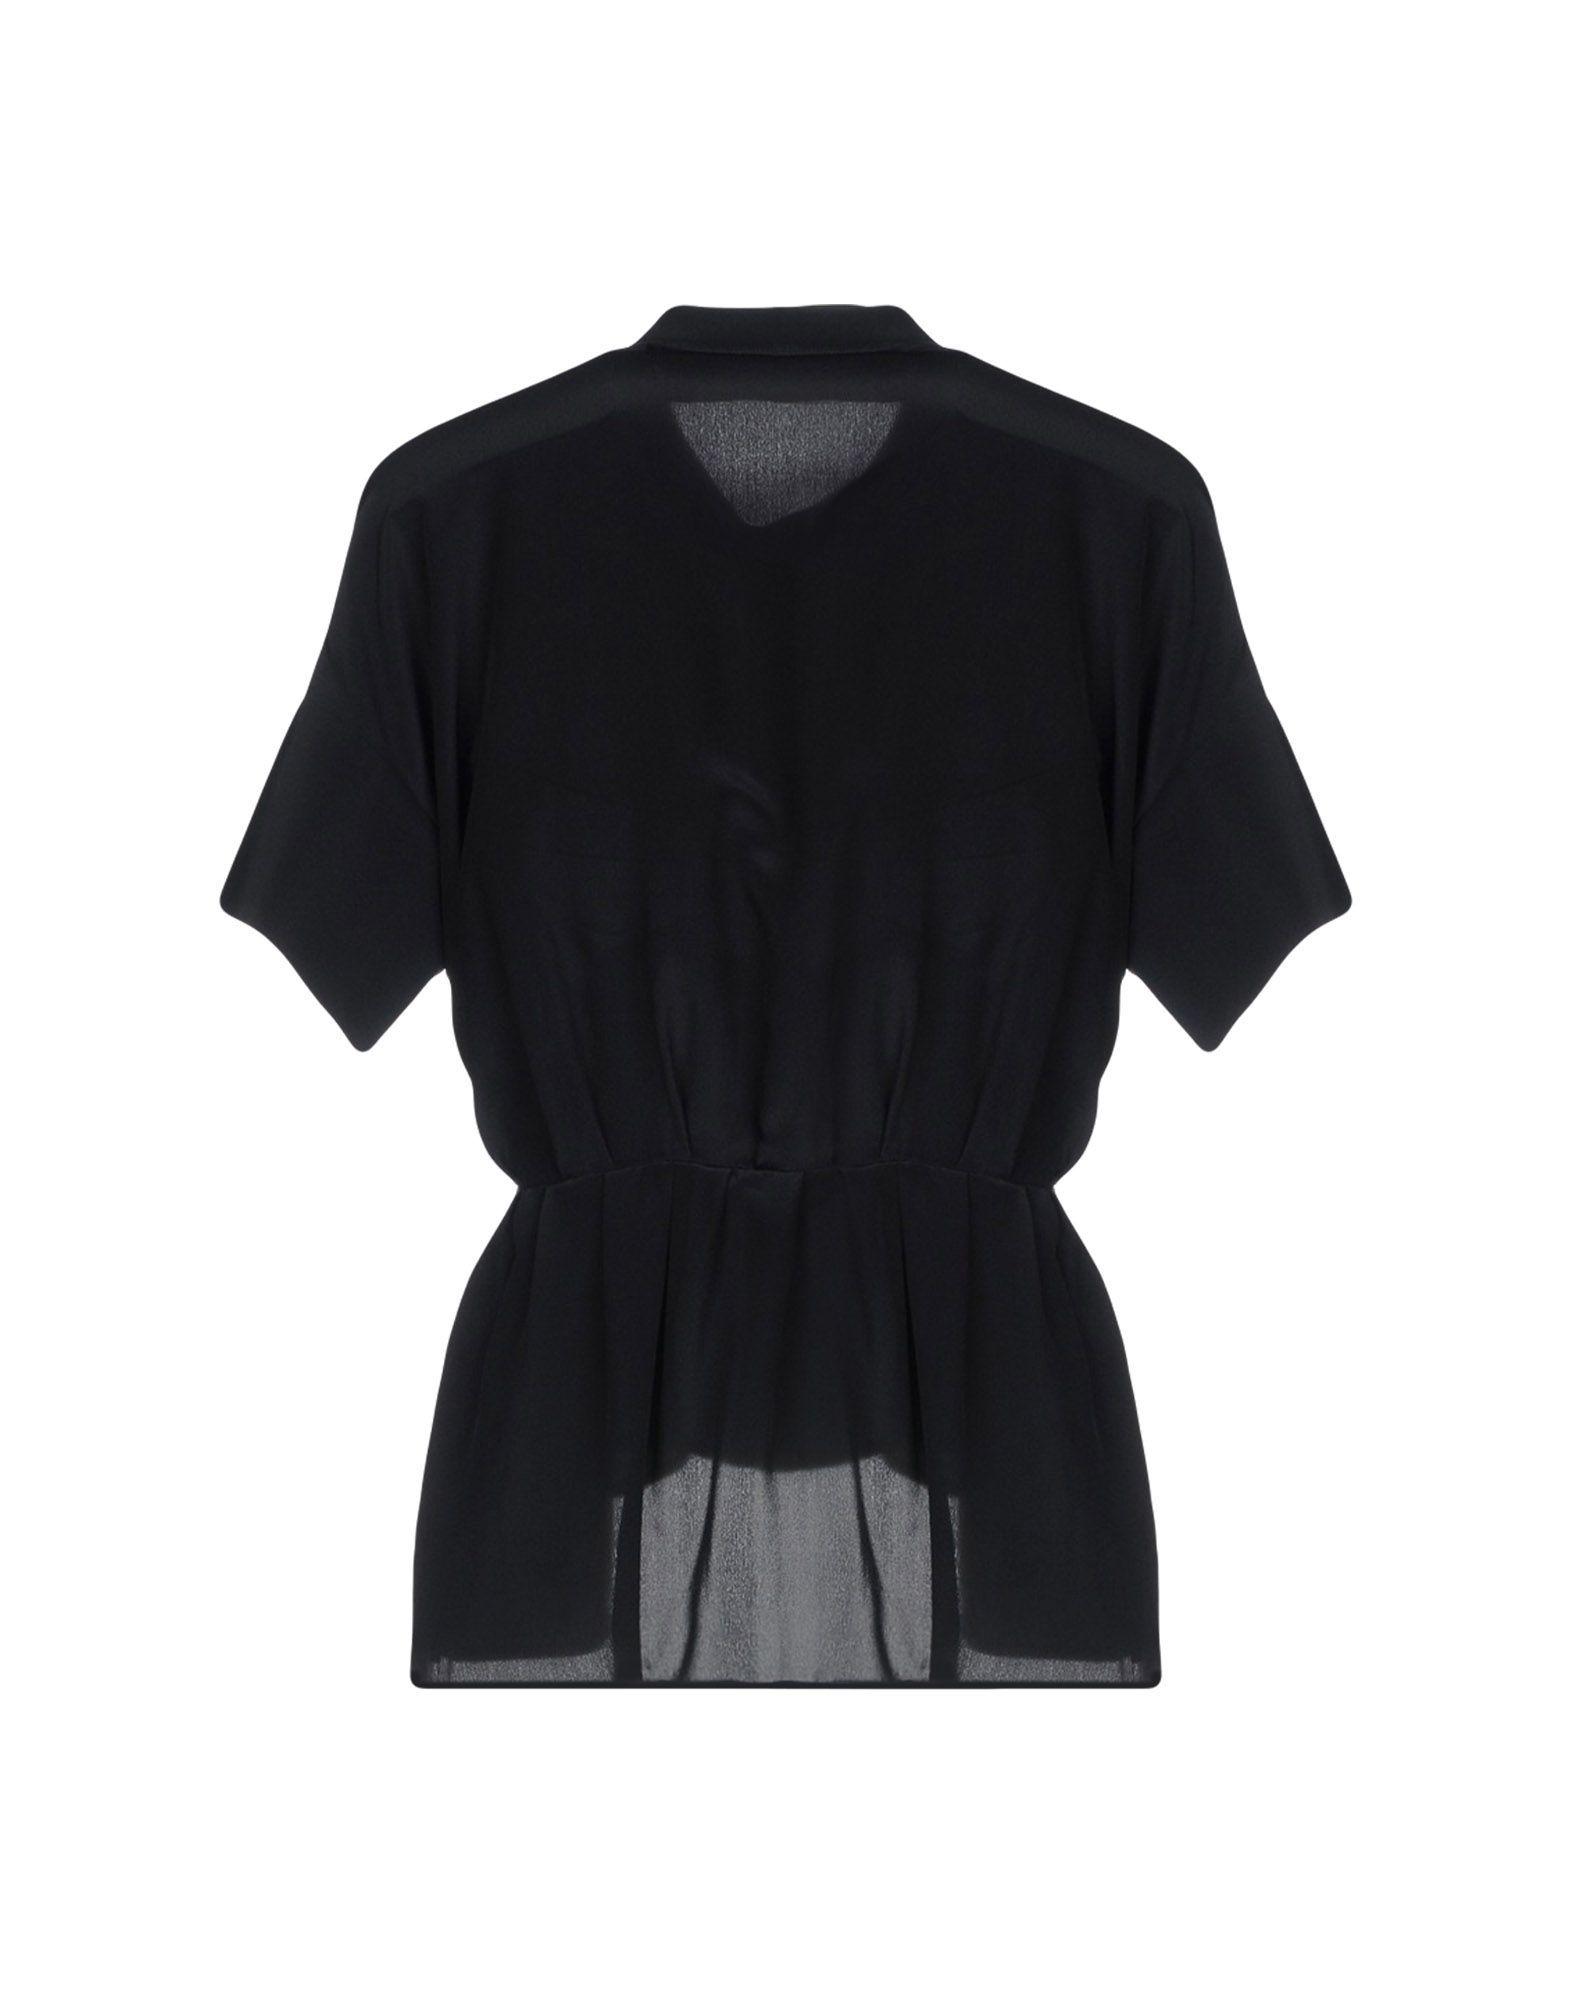 Victoria Beckham Black Silk Blouse